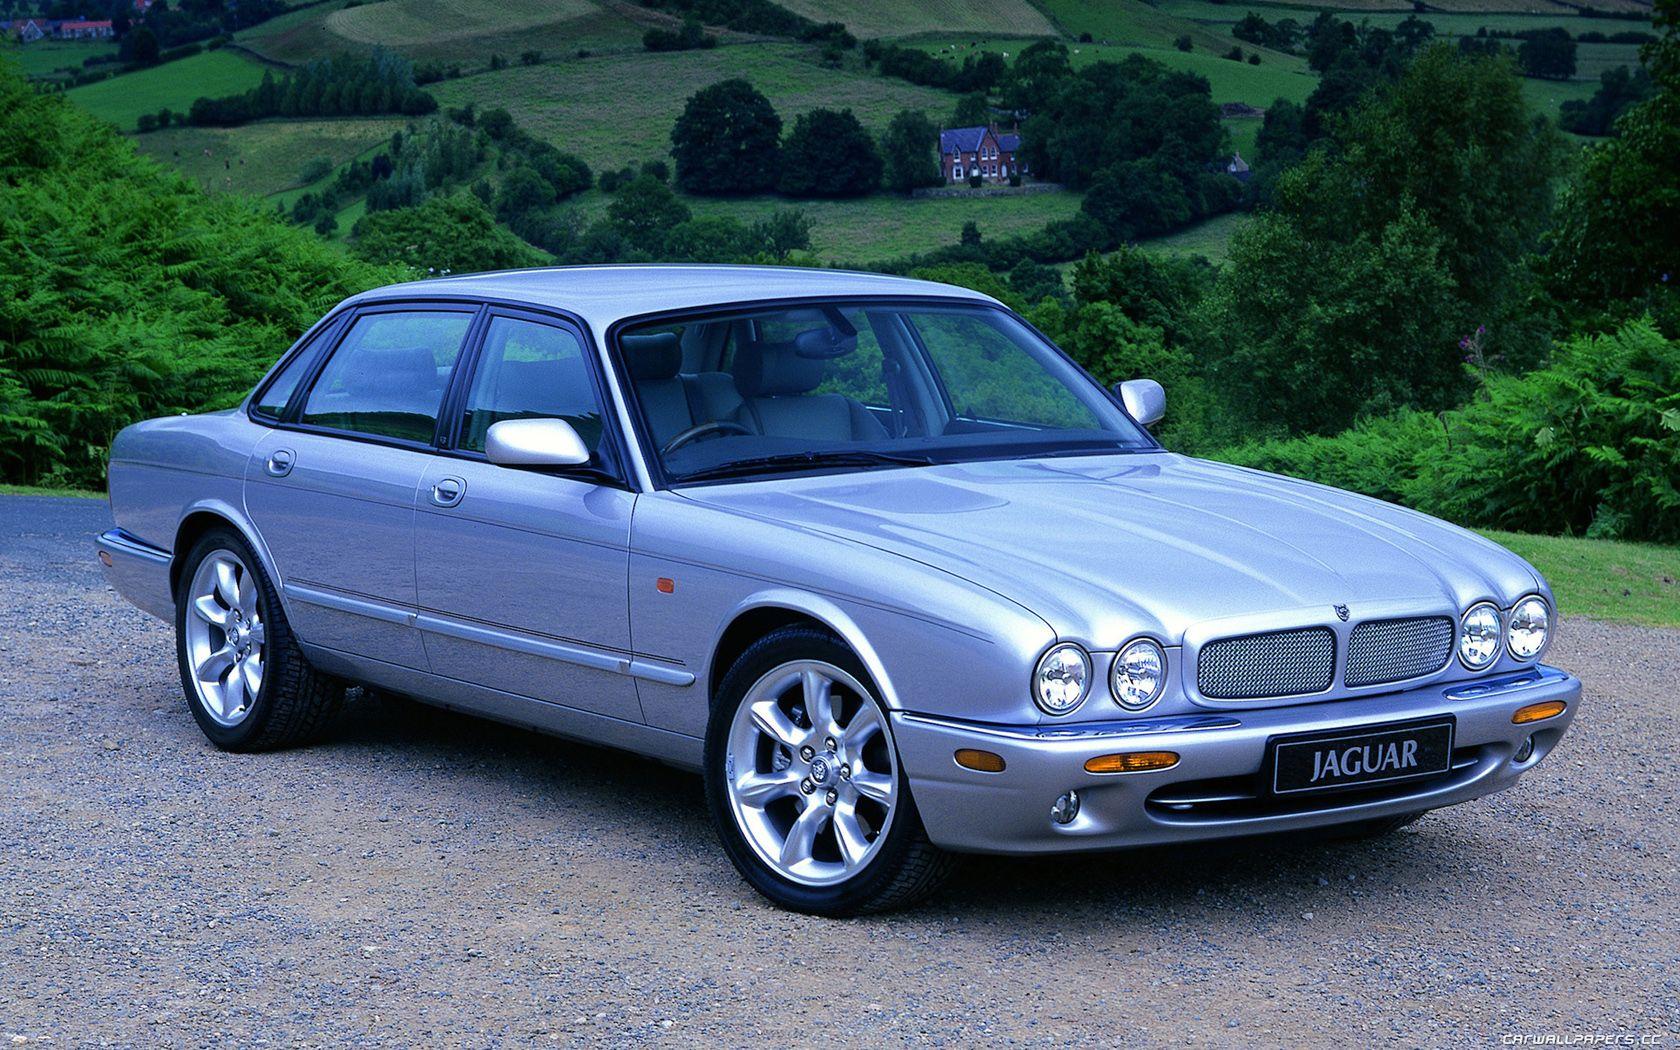 Jaguar xjr limited edition cool cars pinterest cars jaguar xj and jaguar daimler